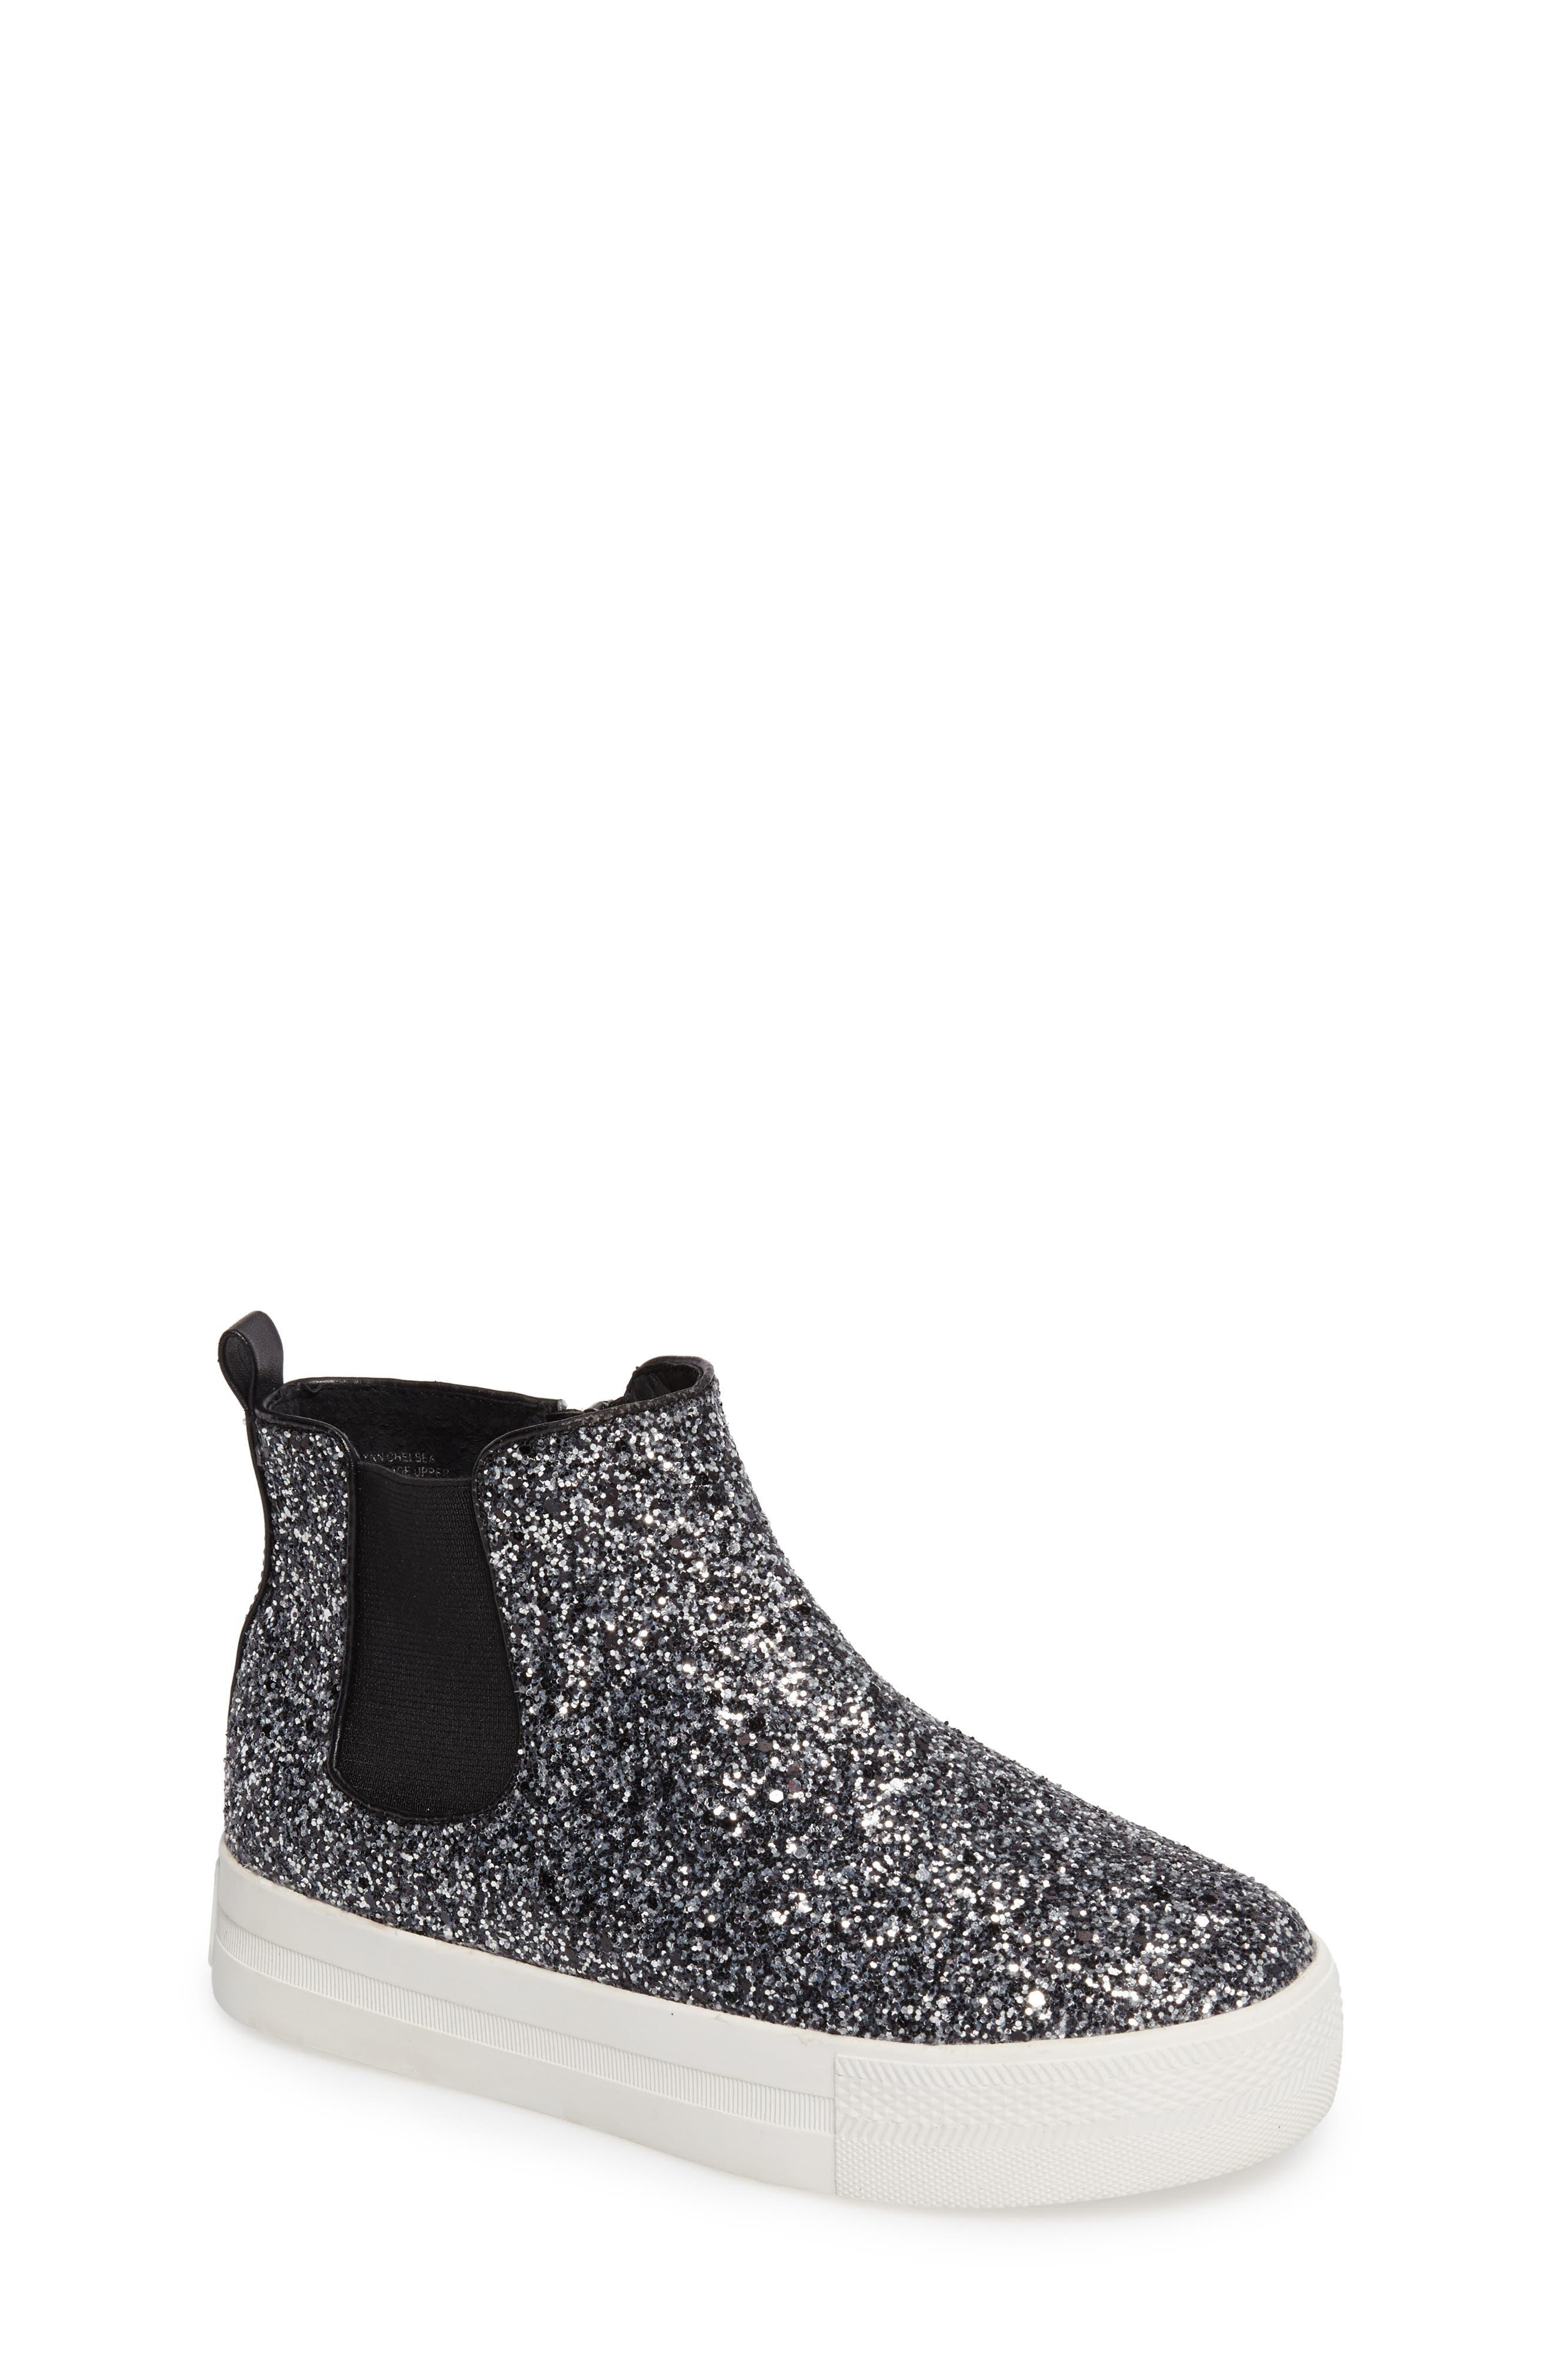 Ash Lynn Glittery Platform Sneaker Boot (Toddler, Little Kid & Big Kid)